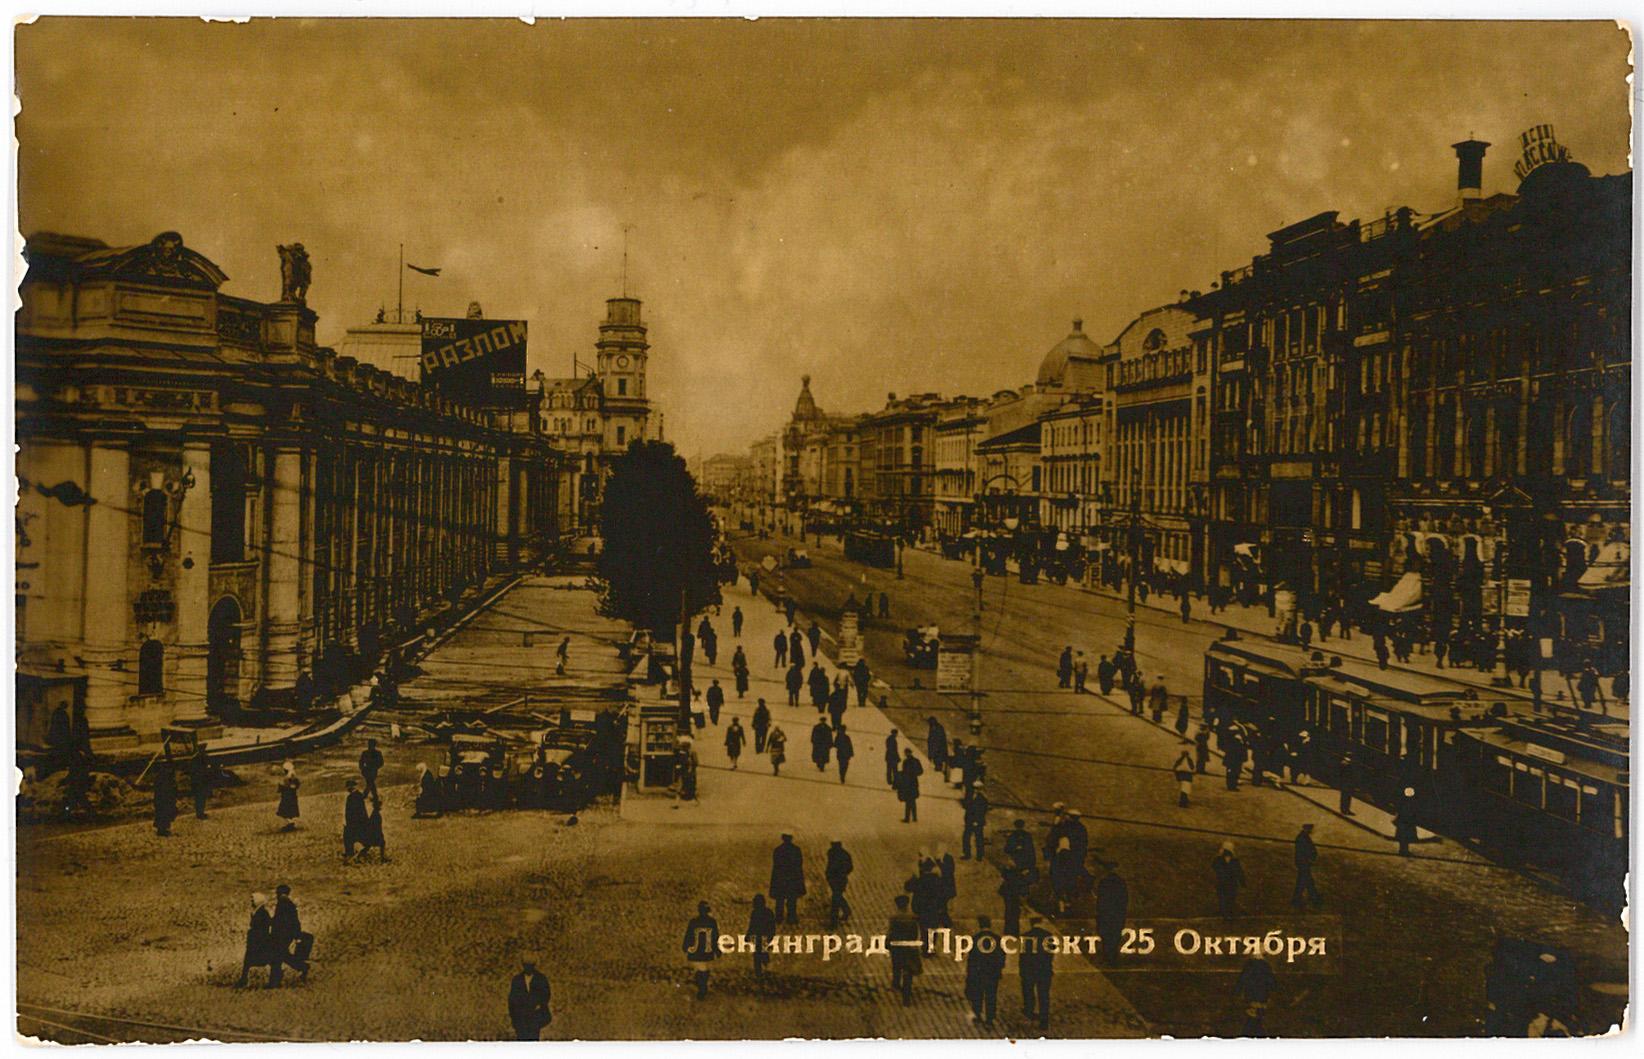 Ленинград. Проспект 25 Октября.